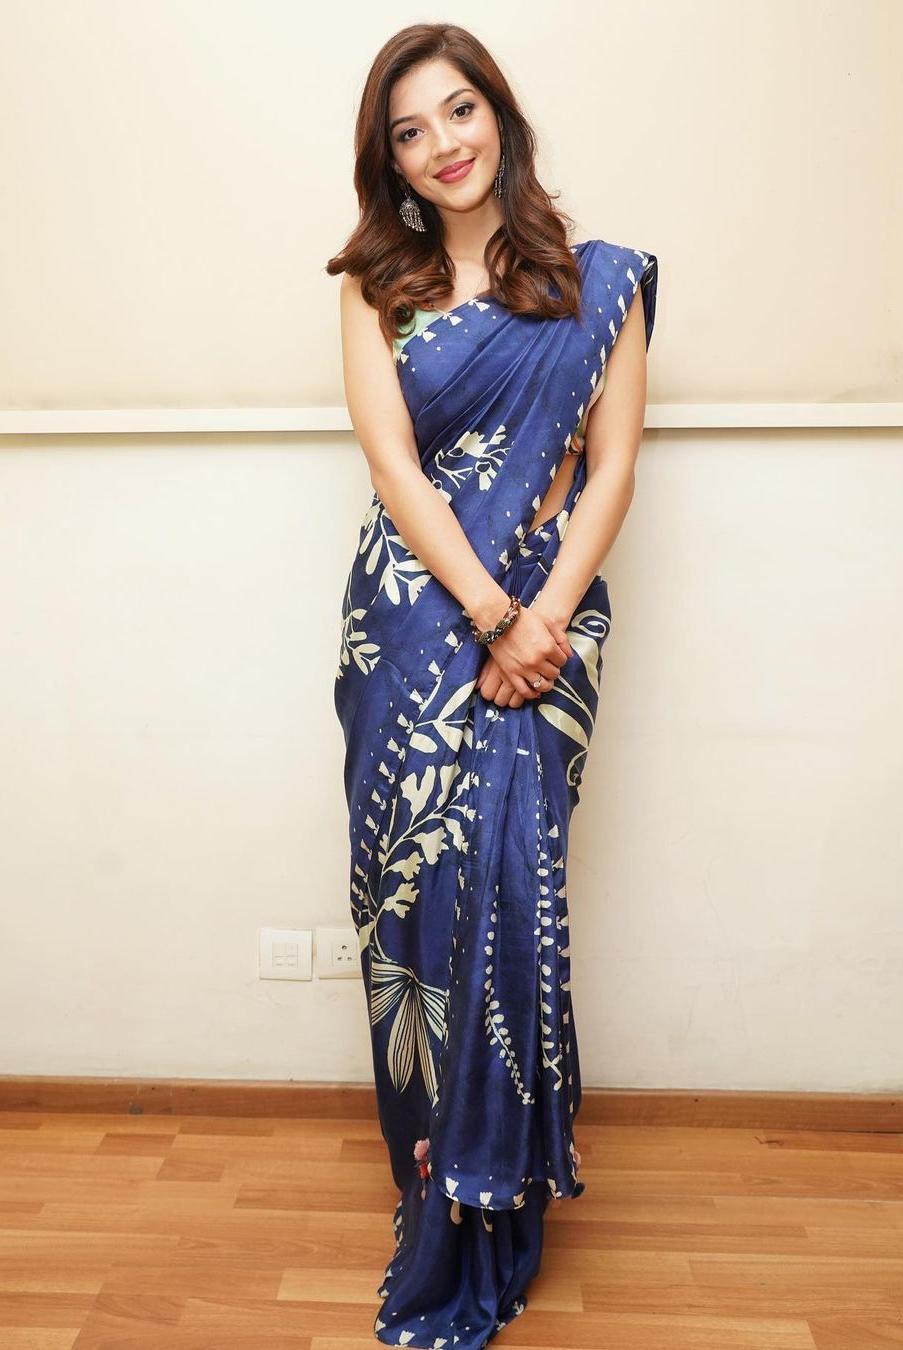 mehreen pirzada at big boss finale in a royal blue saree